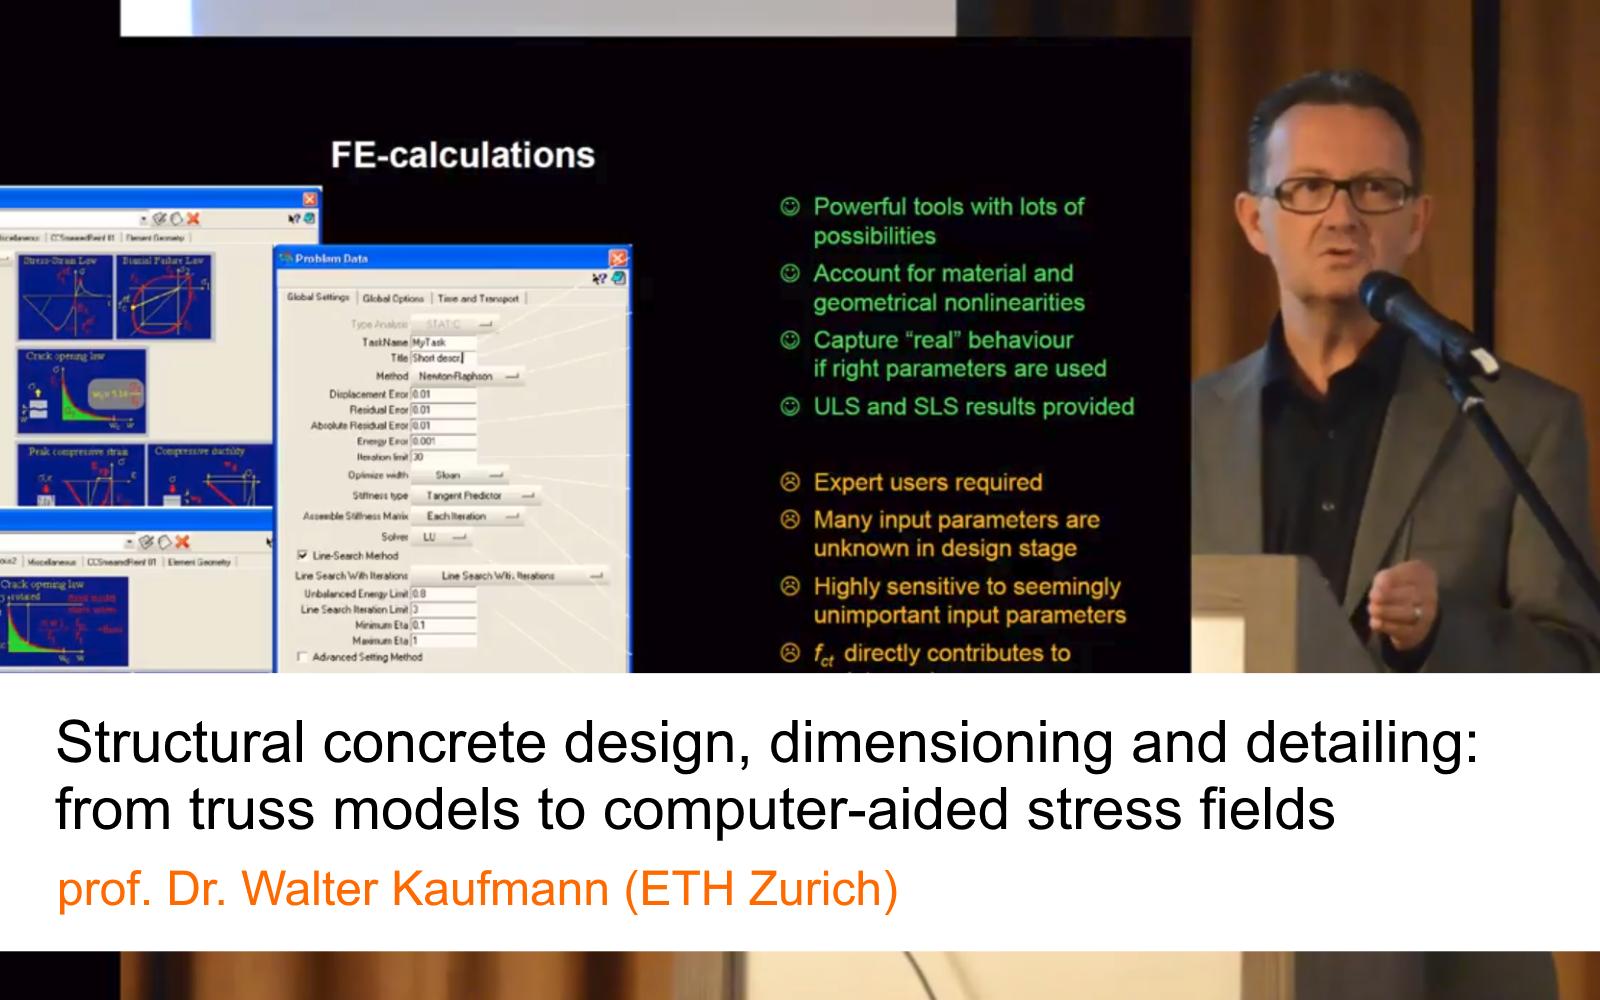 Prof. Kaufmann's lecture on IDEA StatiCa Detail